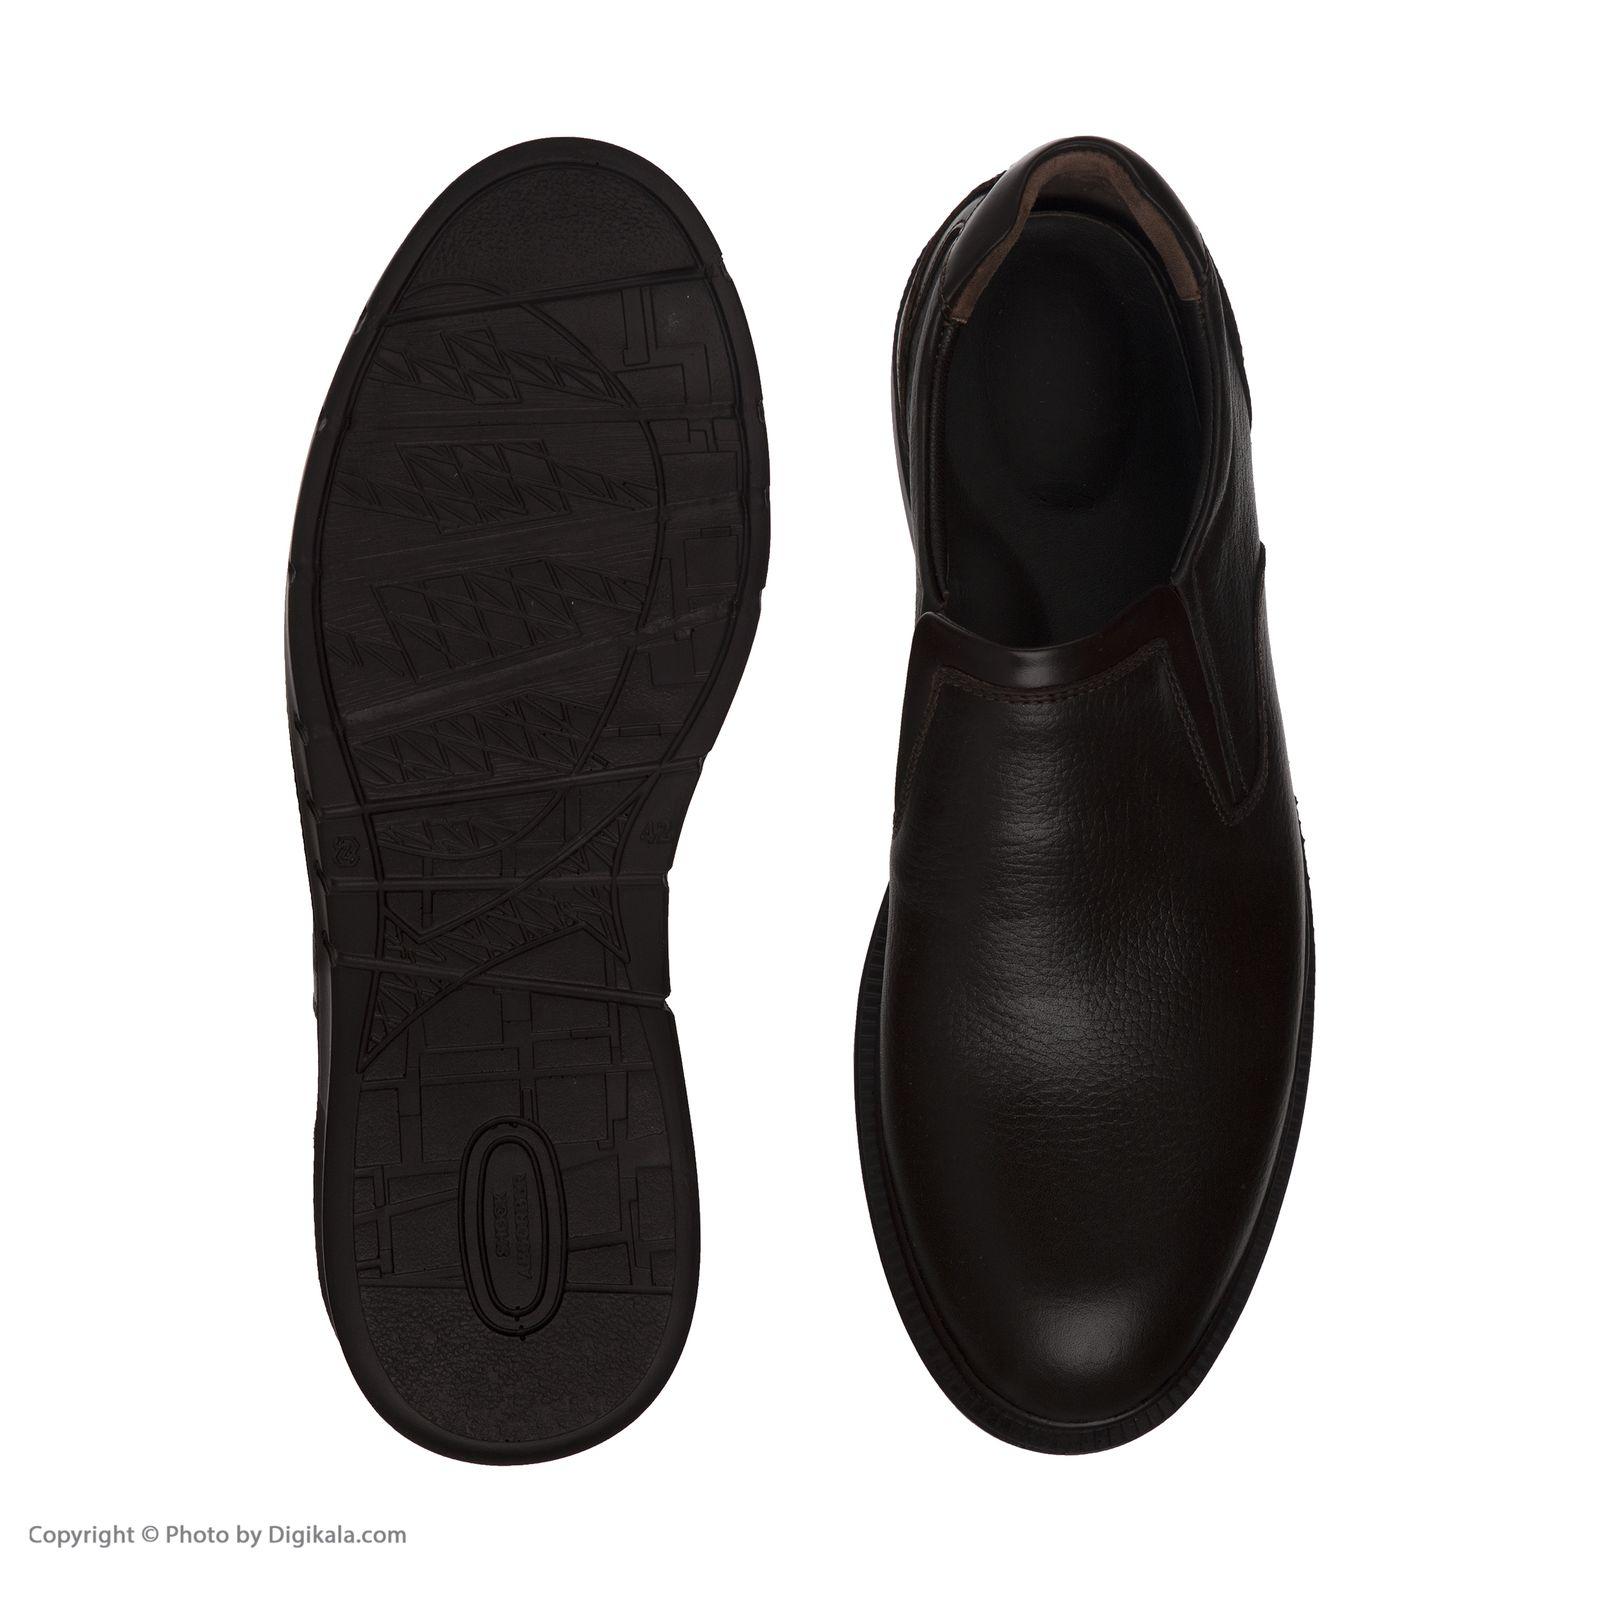 کفش روزمره مردانه بلوط مدل 7240C503104 -  - 4